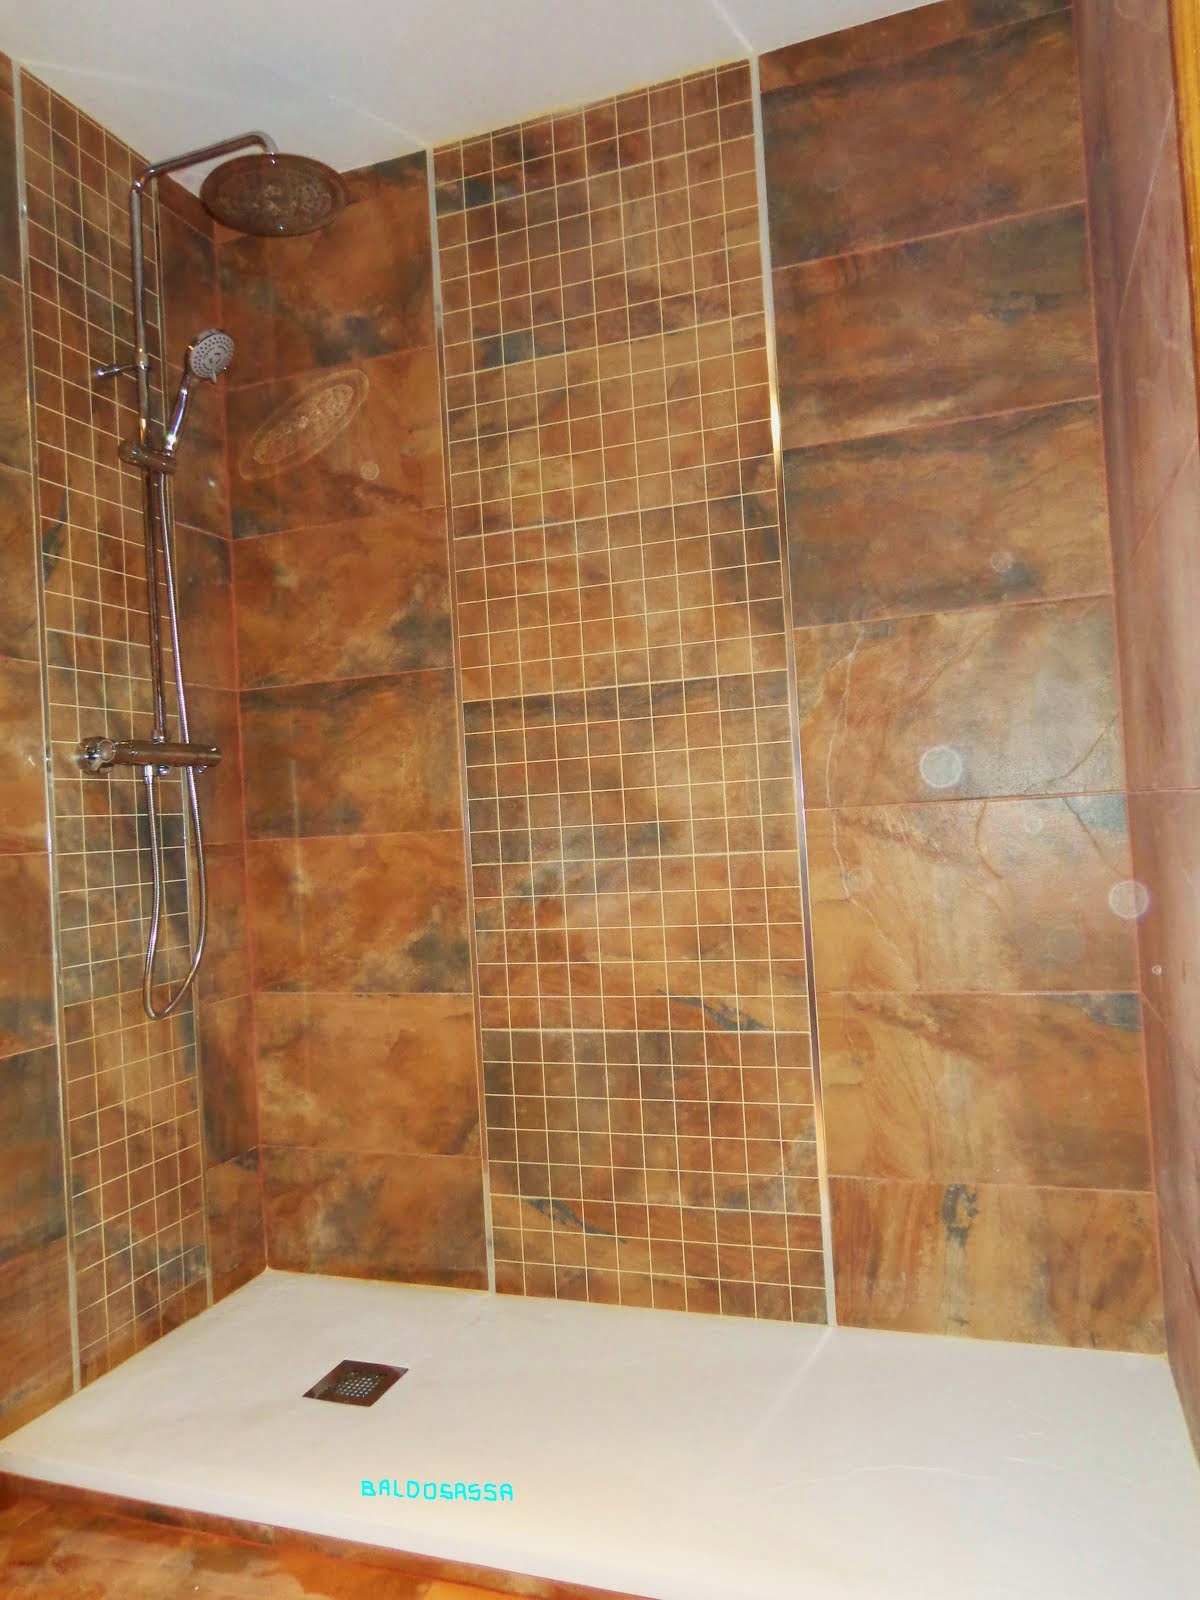 Quitar Azulejos Baño:BALDOSAS SA : COMO QUITAR UN BIDÉ DE UN BAÑO Tiempo estimado 4 horas